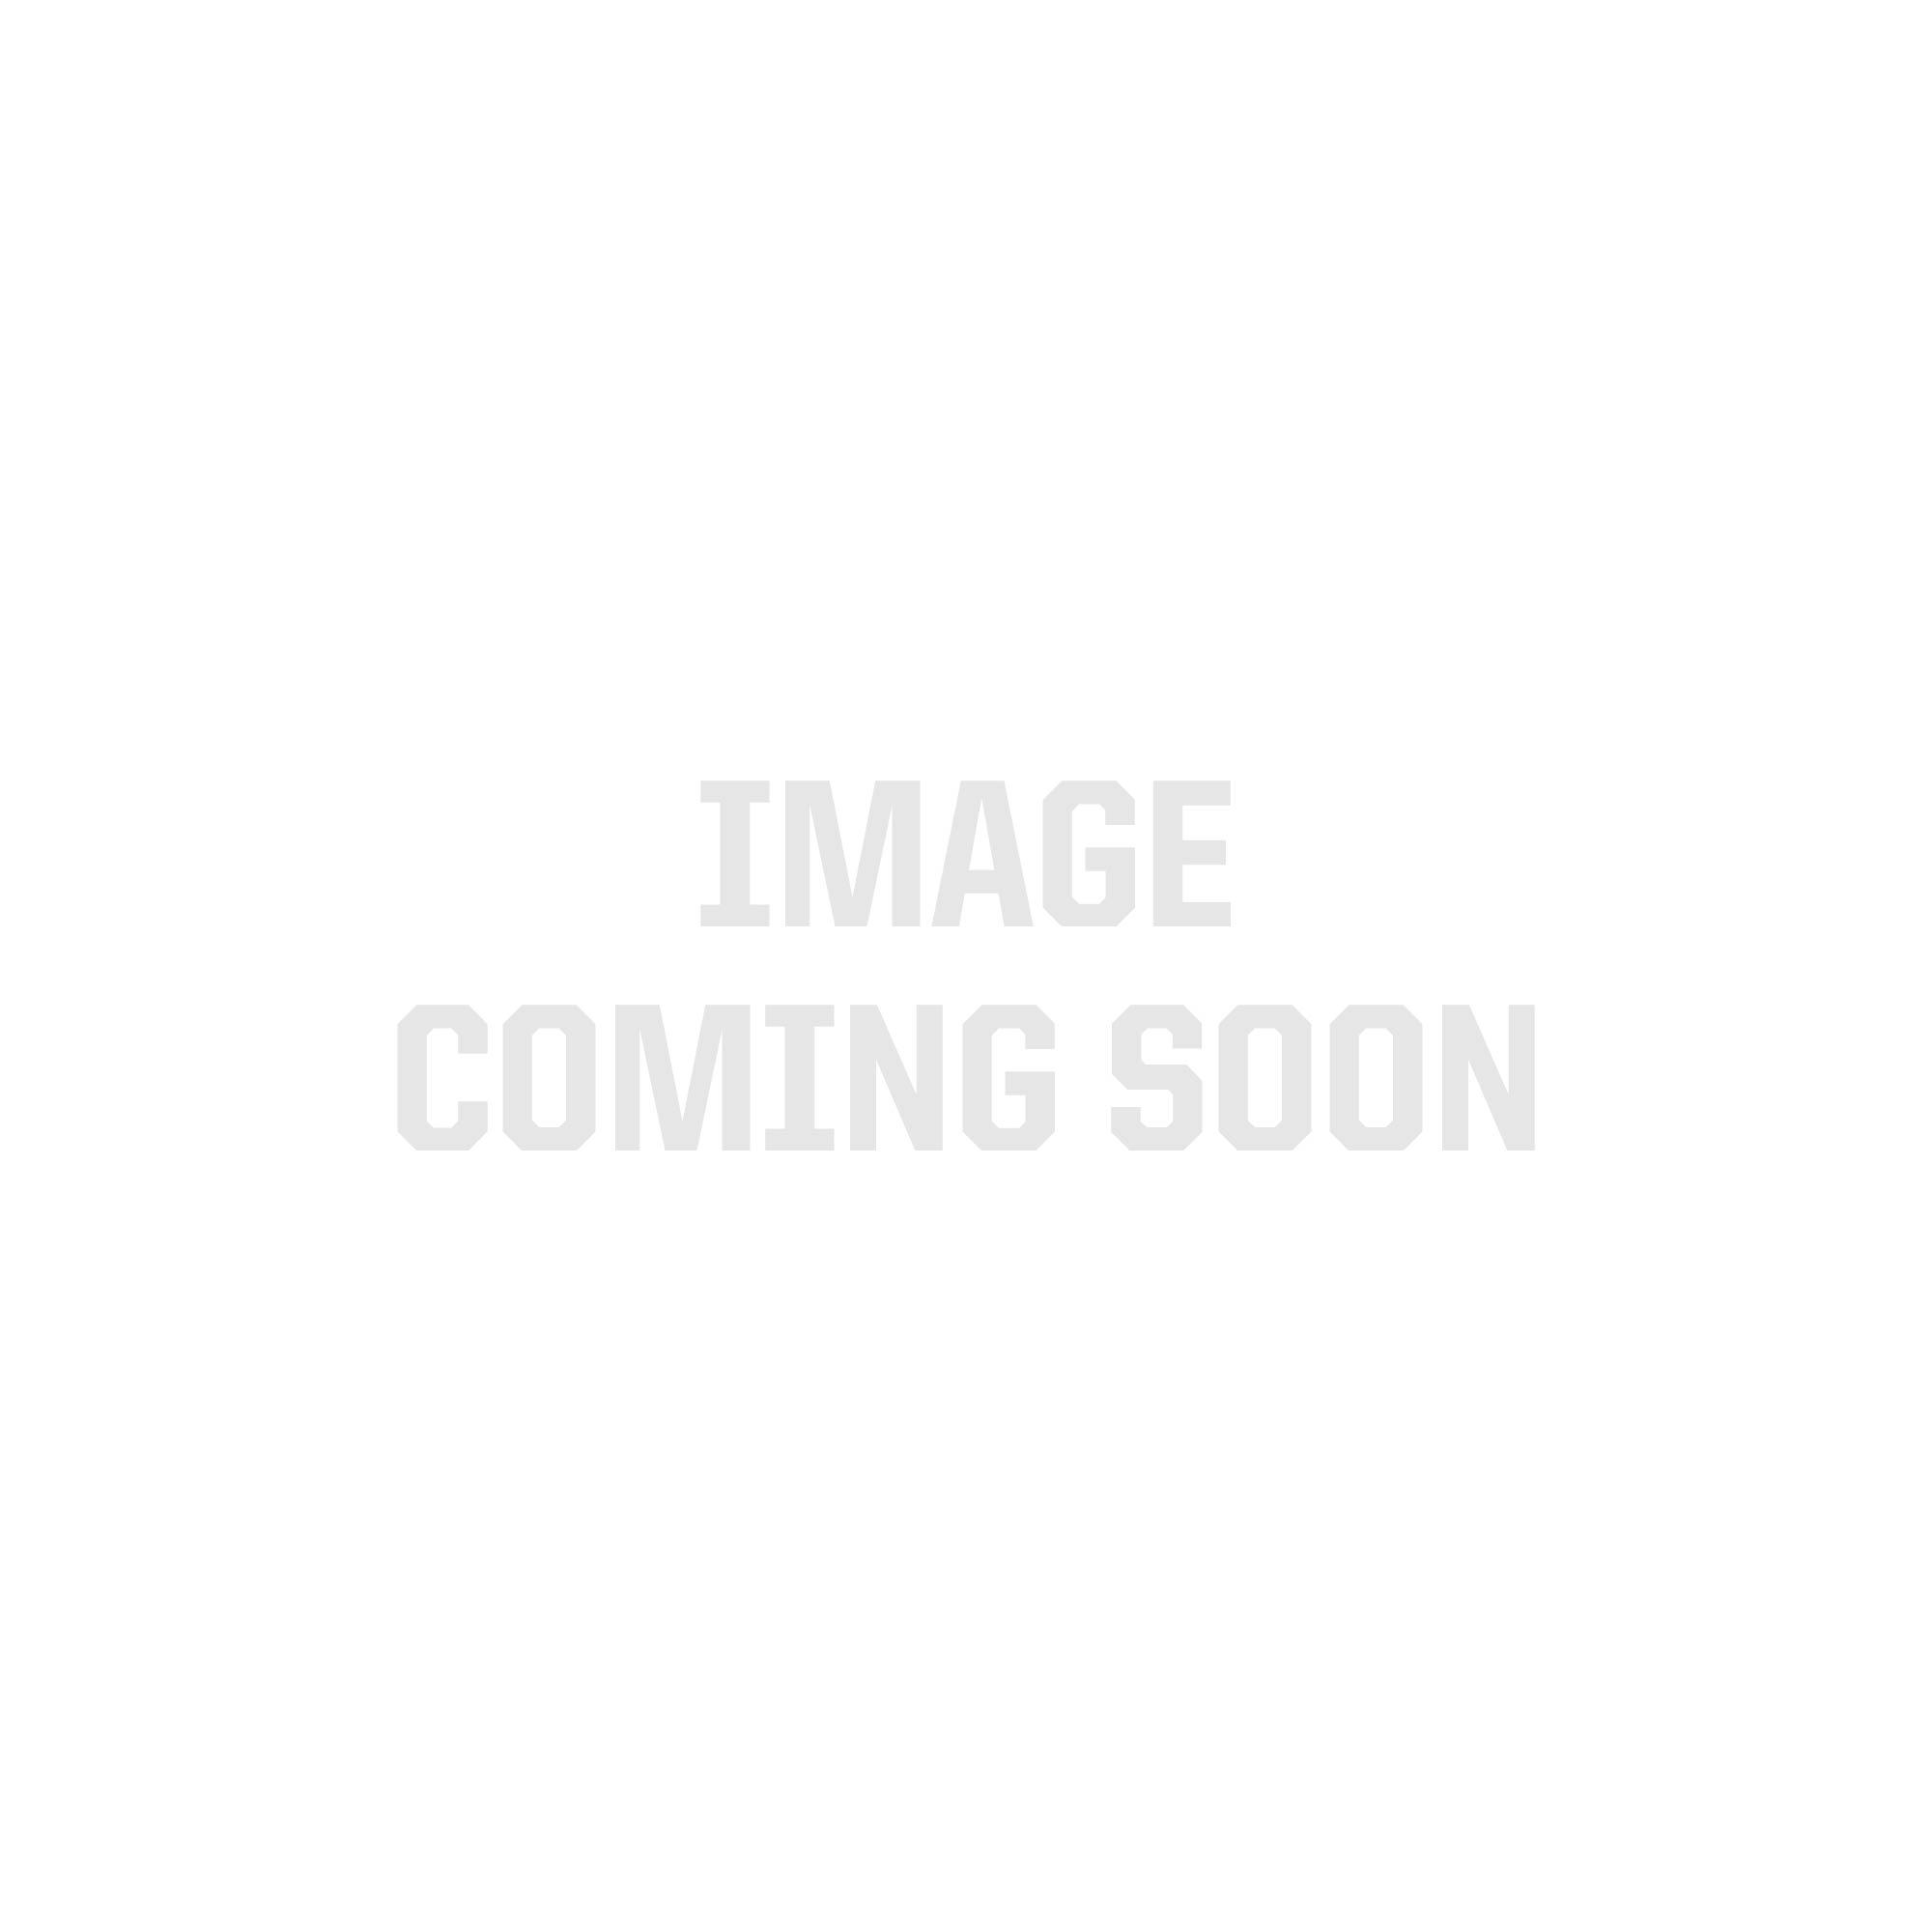 MOLLE Pouches – Tactical Pouches for Vests, Bags & Belts - 5 11 Tactical